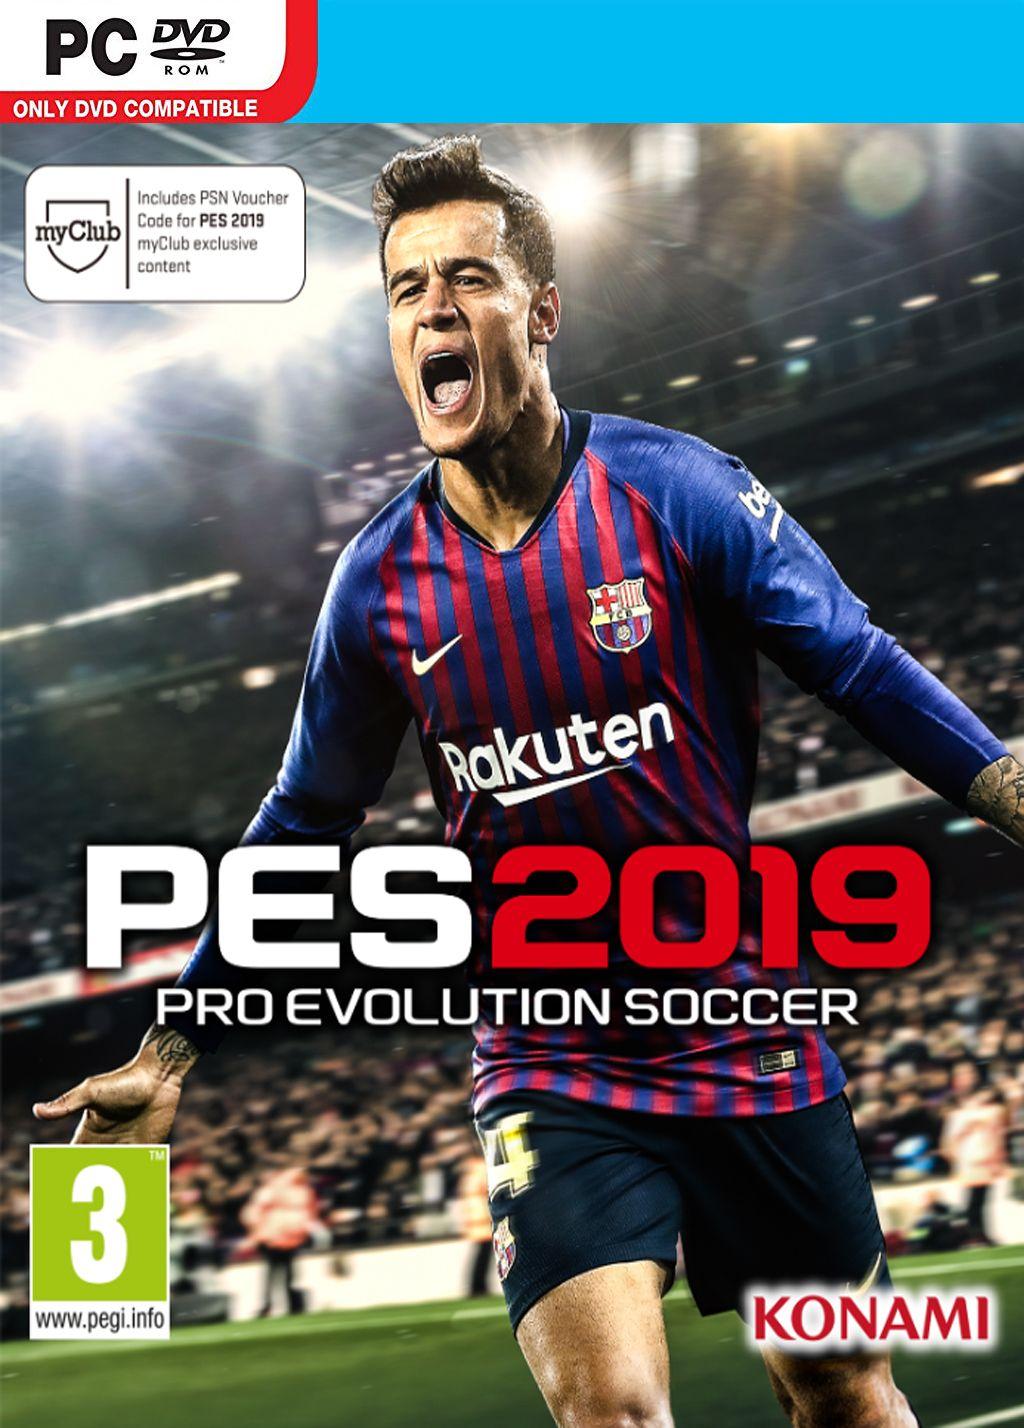 نتيجة بحث Google عن الصور حول Http Uupload Ir Files Pmvy Pes 2018 Pc Cover Jpg Pro Evolution Soccer Evolution Soccer Ps4 Games